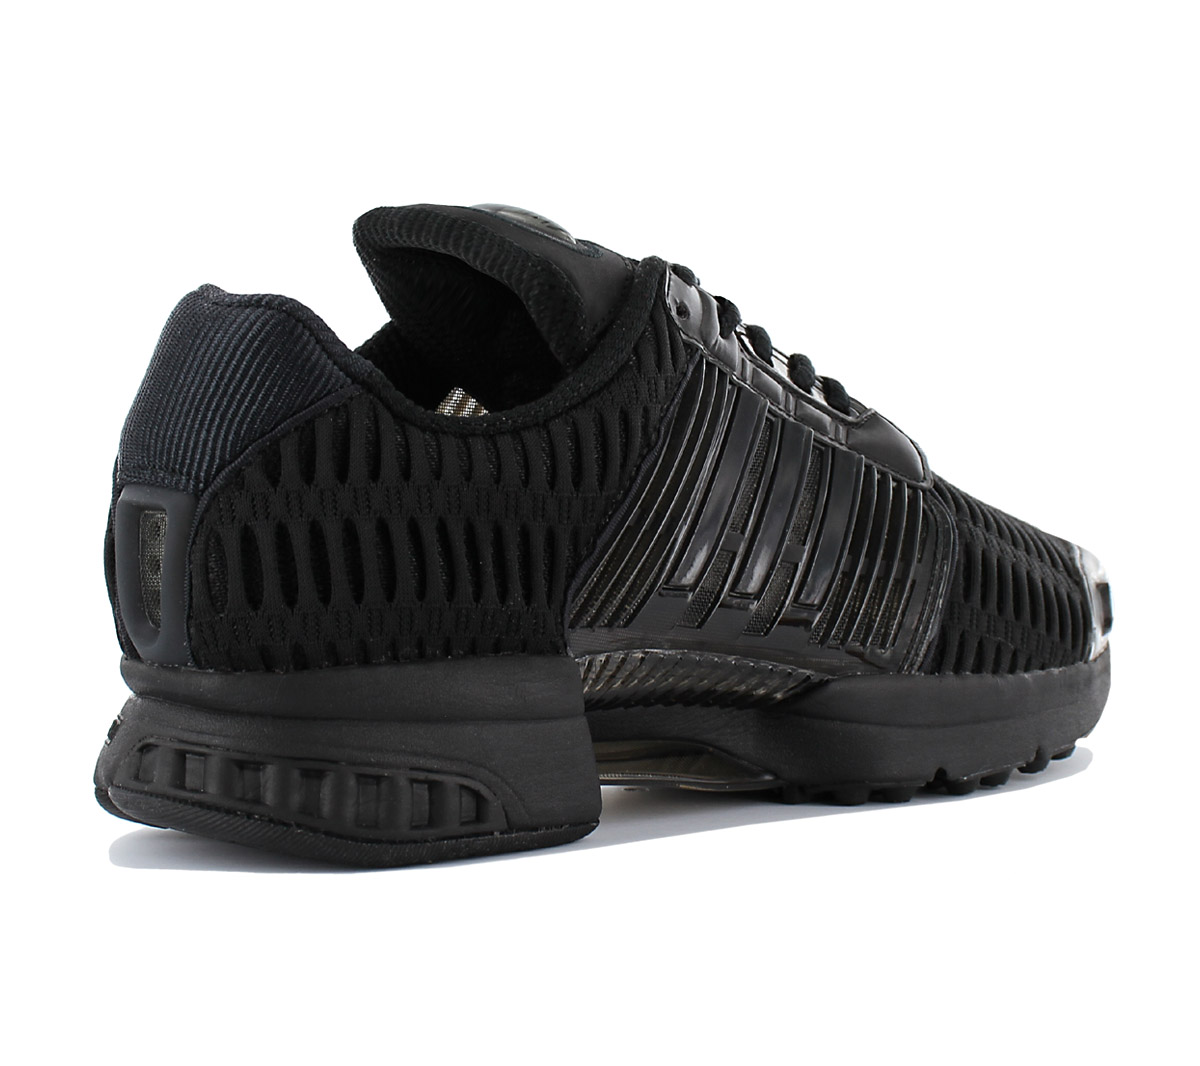 Details about Adidas Originals Climacool 1 Shoes Sneaker Trainers Clima Cool Black BA8582